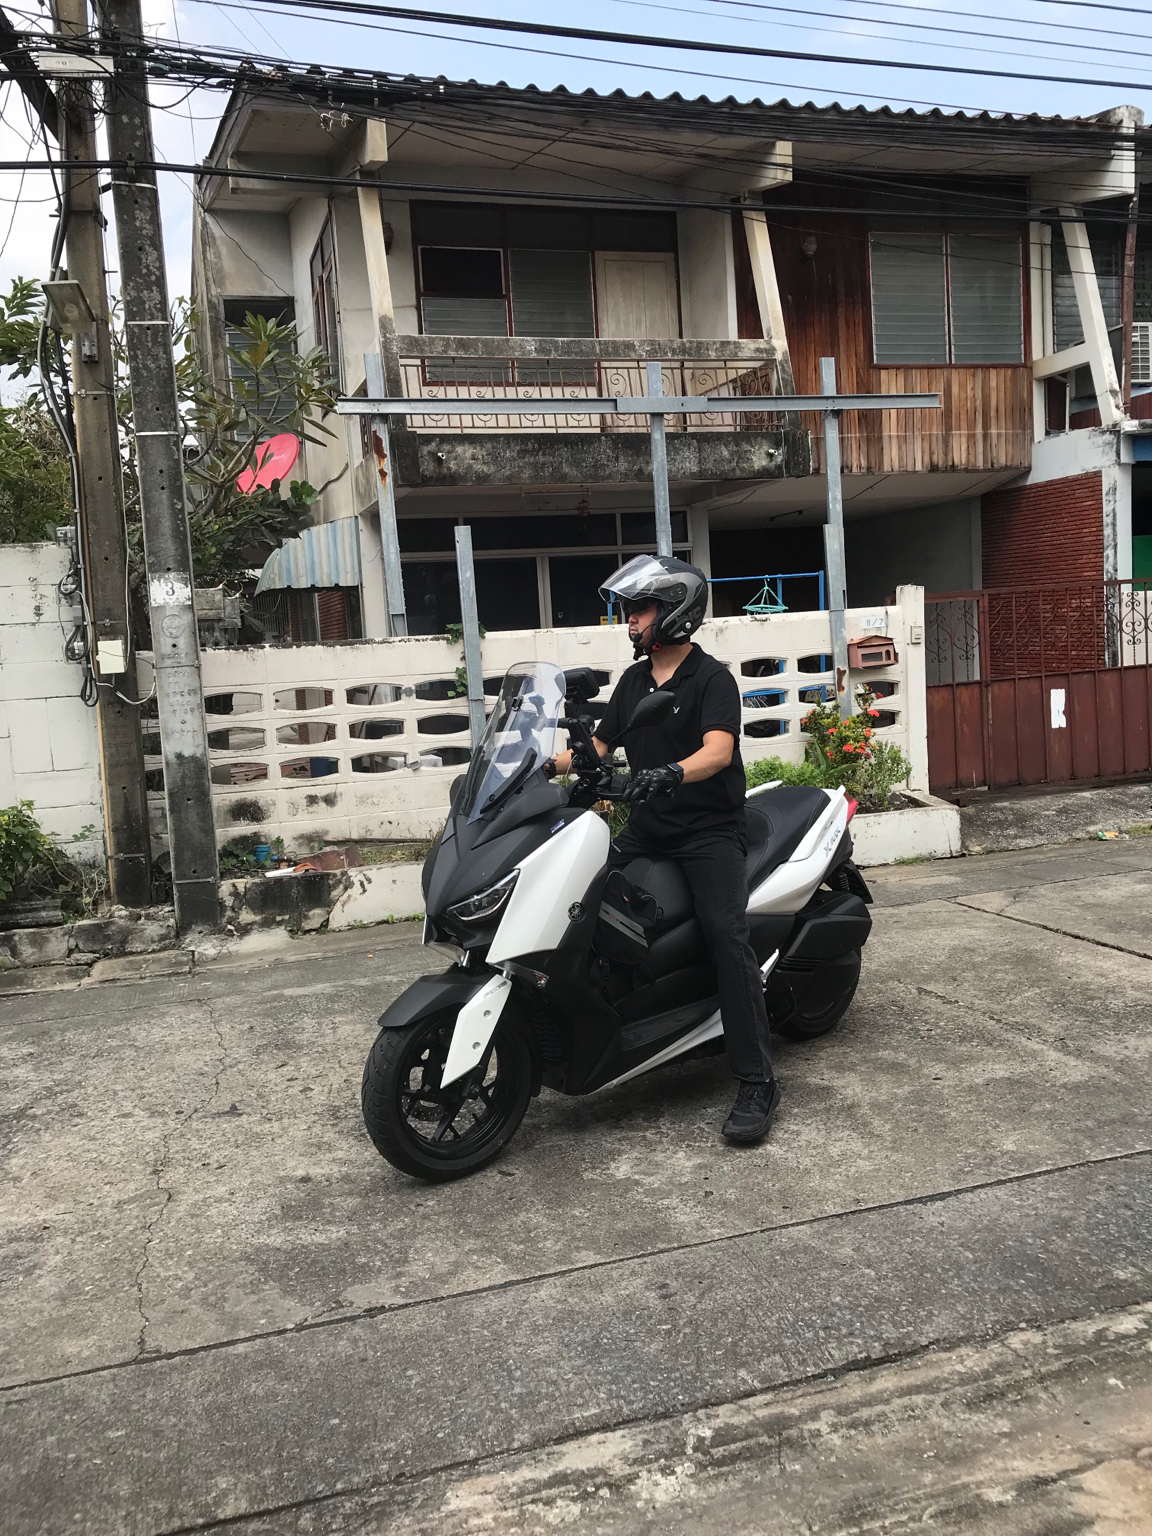 Yamaha Xmax 300 coming to Thailand? - Page 13 - Motorcycles